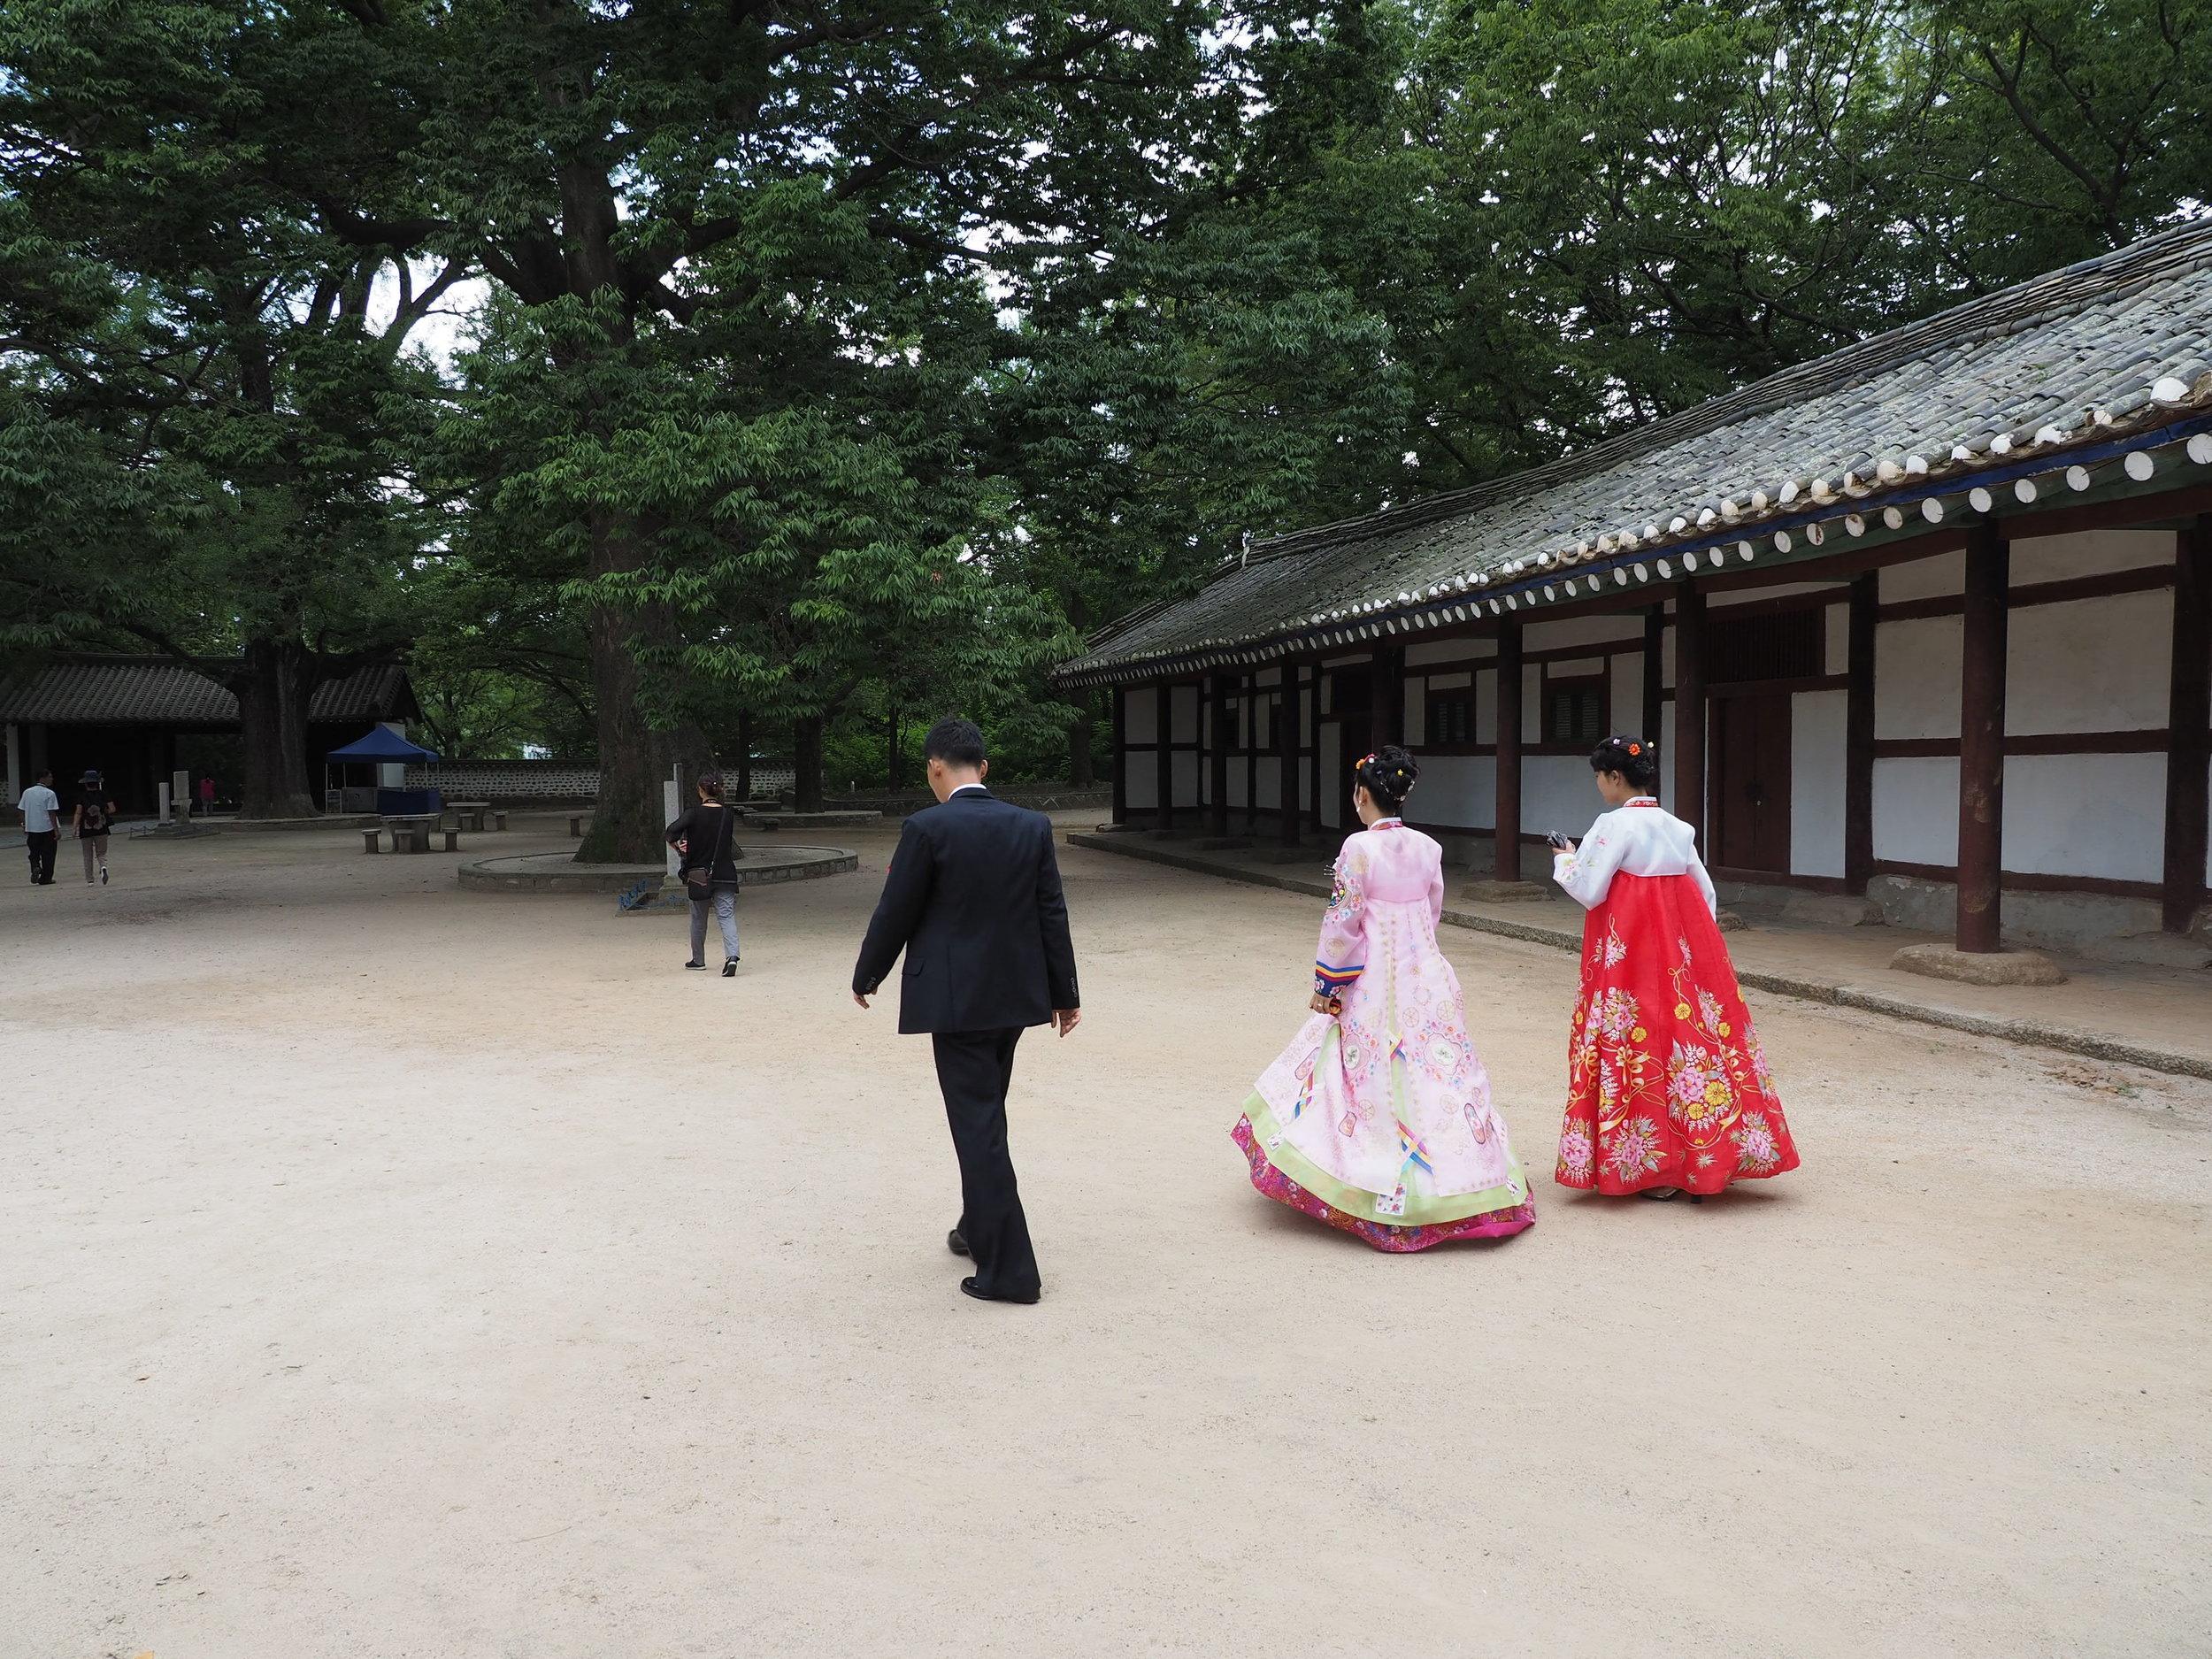 Wedding happening at the Koryo History Museum